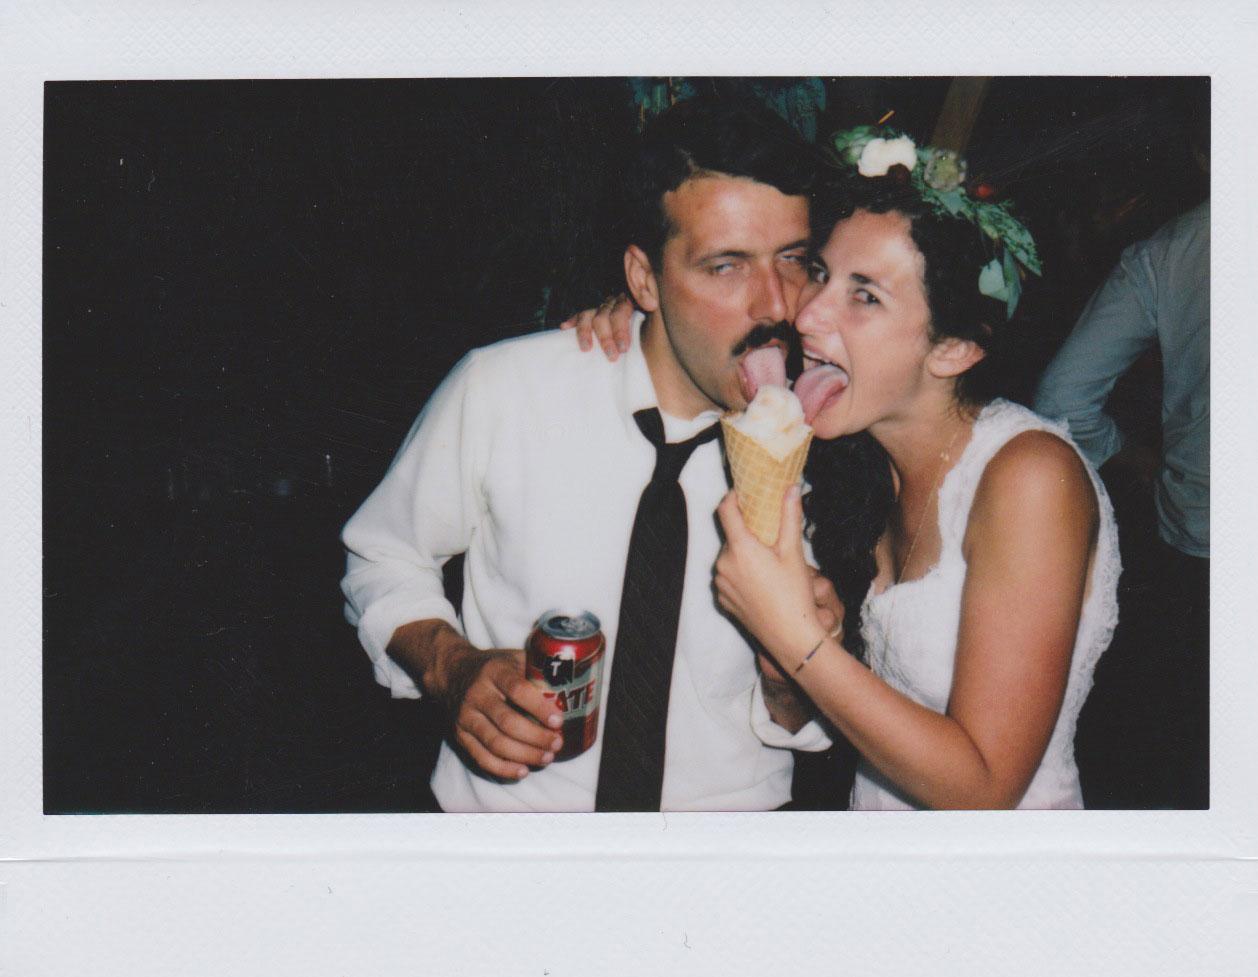 team-aromma-wedding-1.jpg